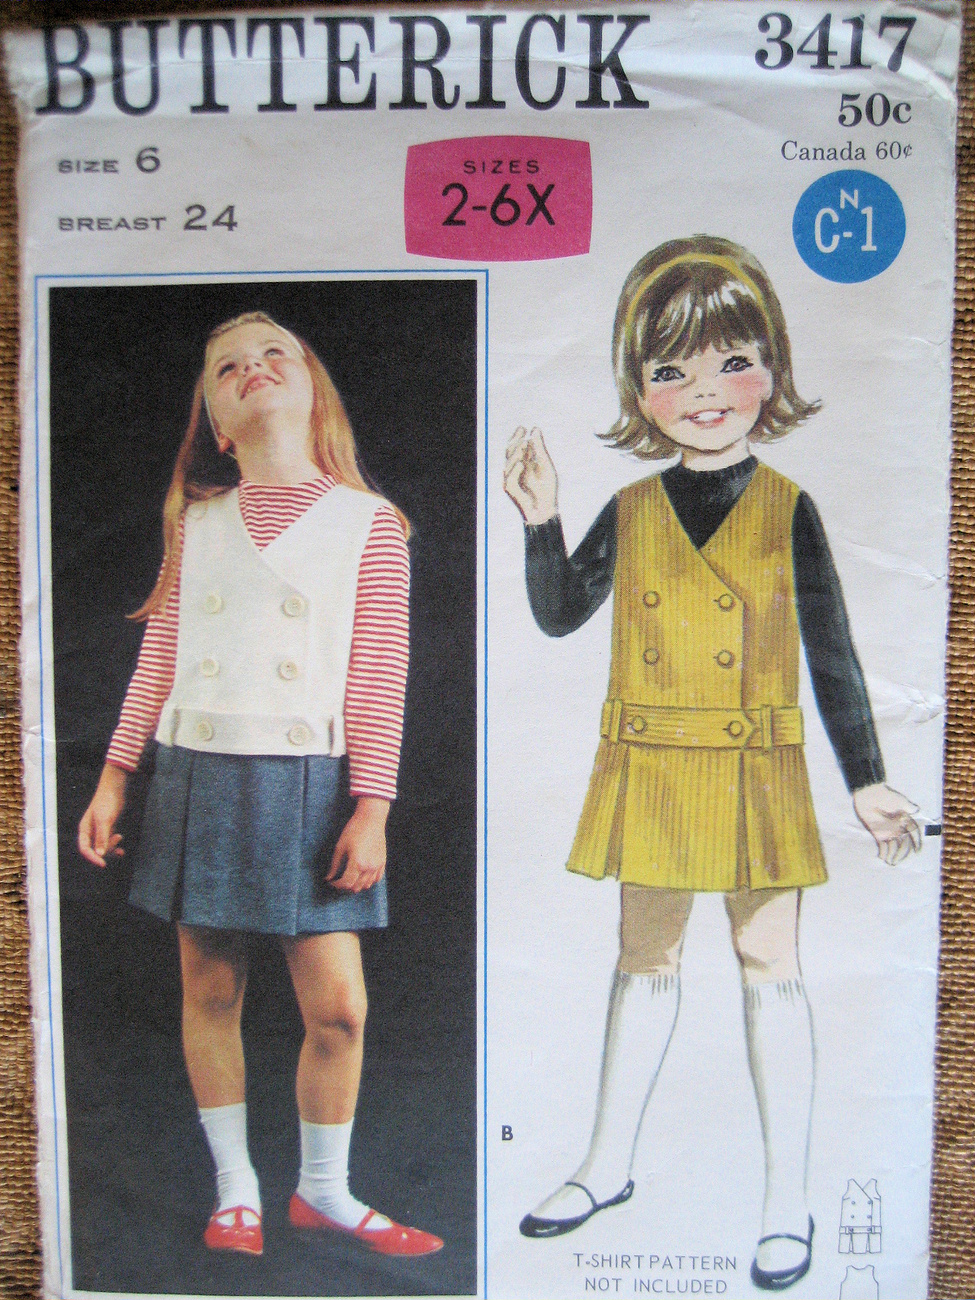 Butterick 3417 Vintage 1960s Pattern Girls Size 6 Low Waist Jumper